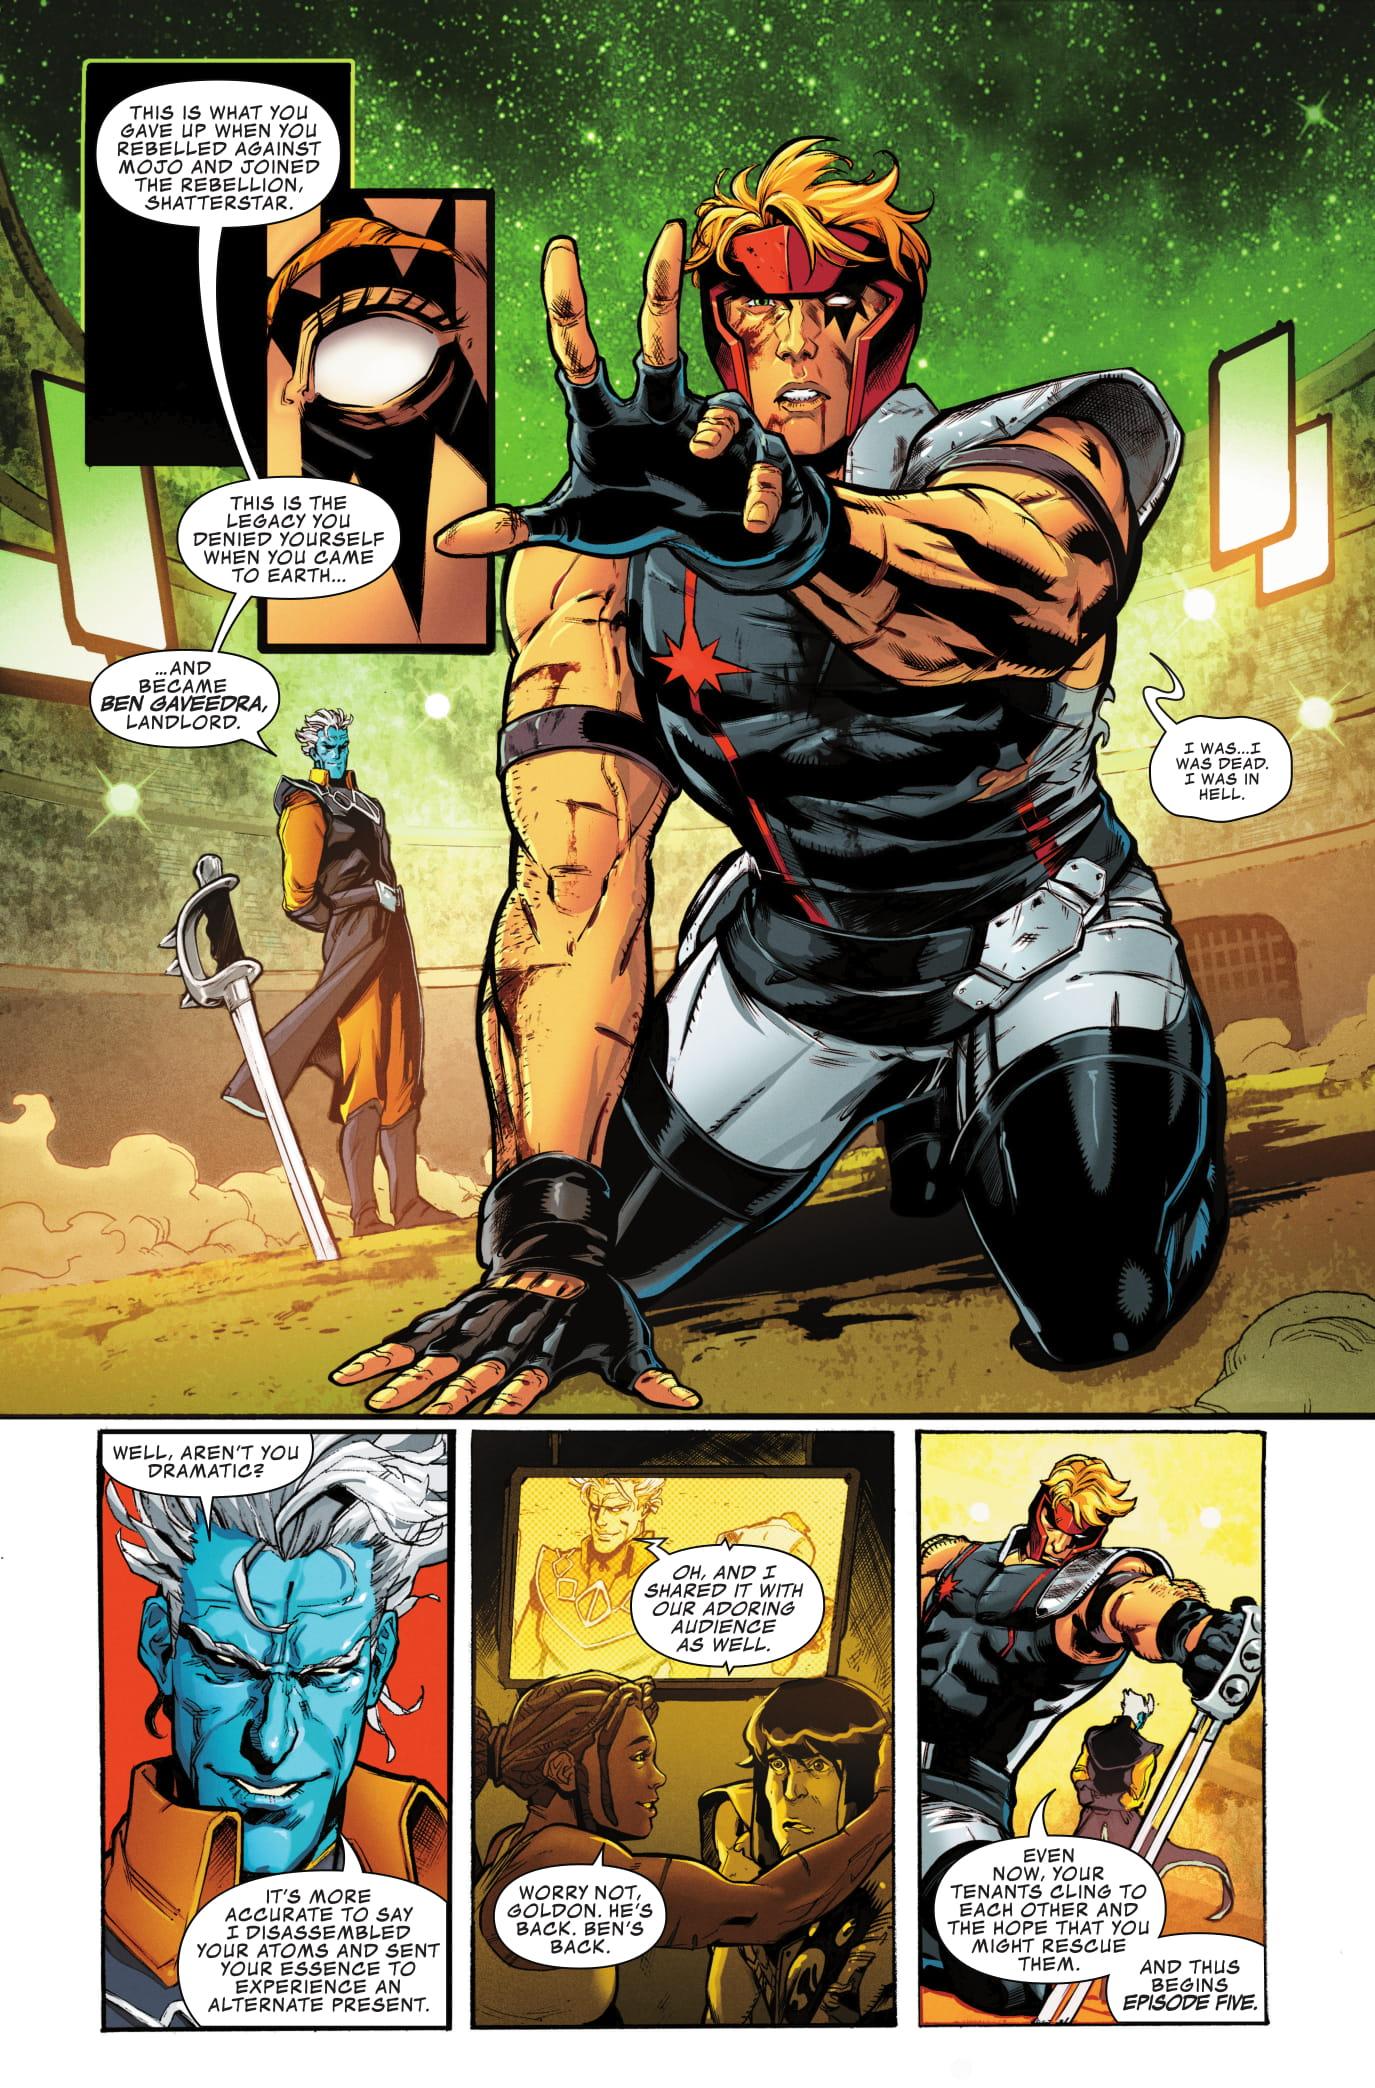 Shatterstar #5 page 4